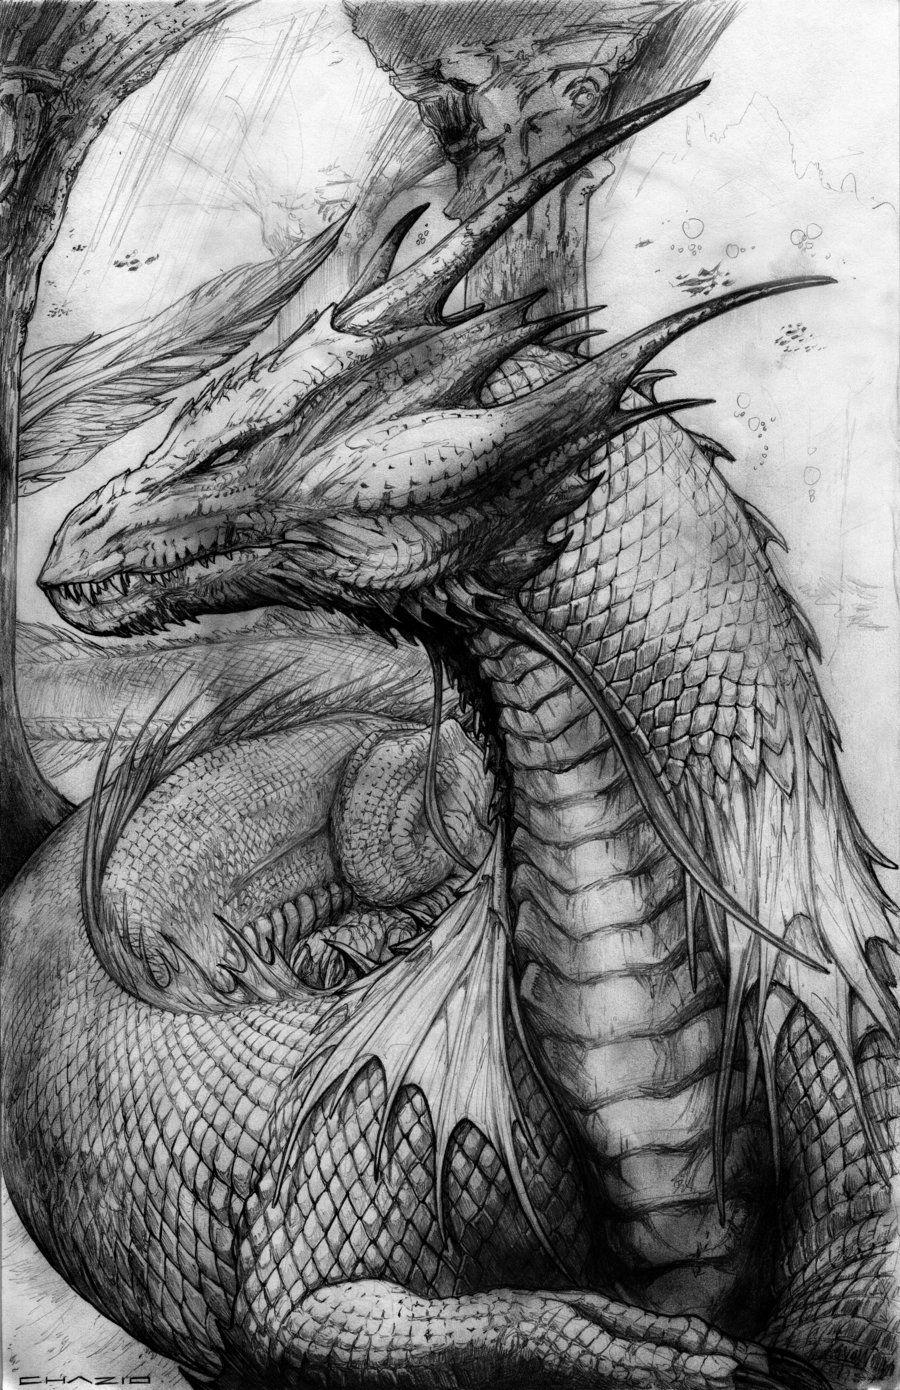 Sand Dragon by ChuckWalton Dragon